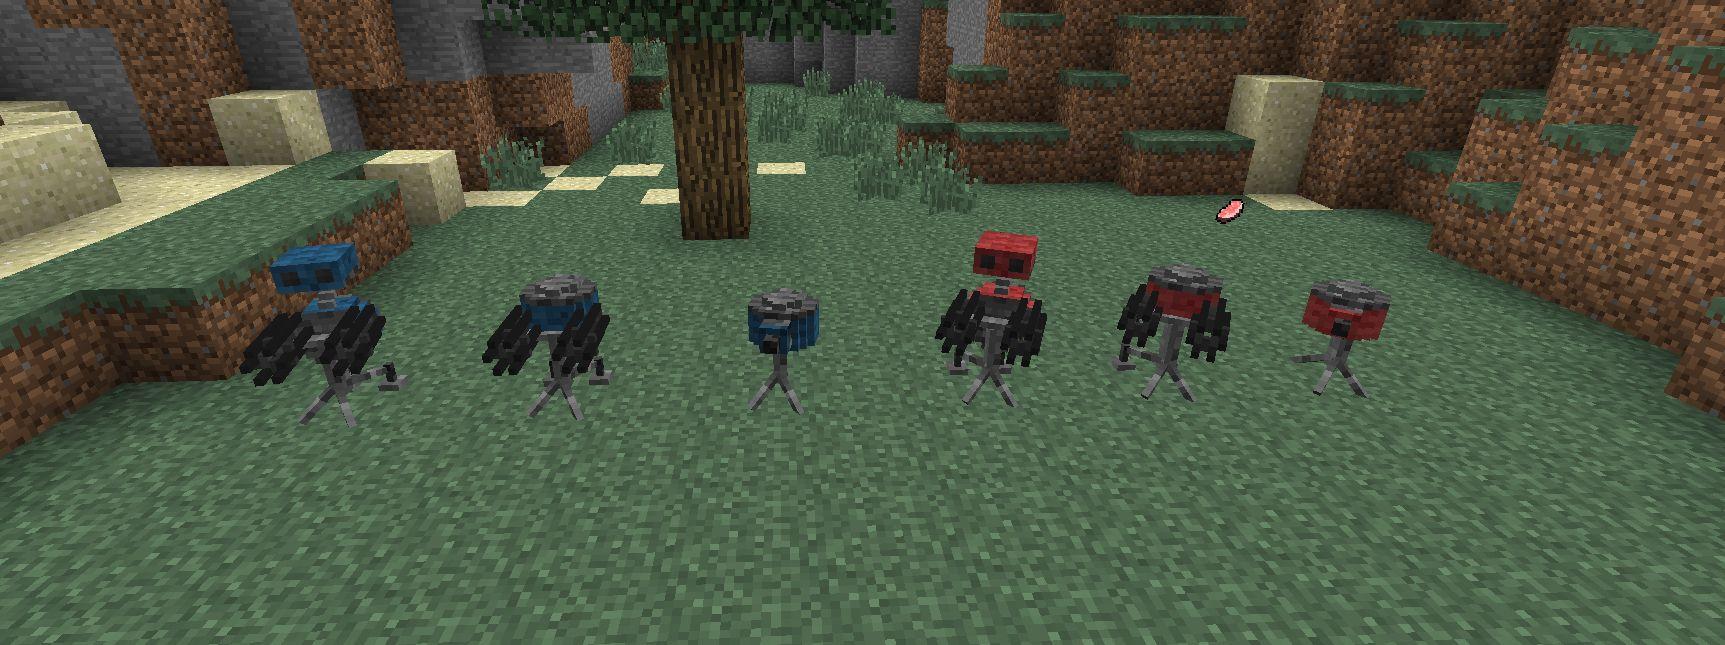 https://img.9minecraft.net/Mod/Team-Fortress-2-1.jpg